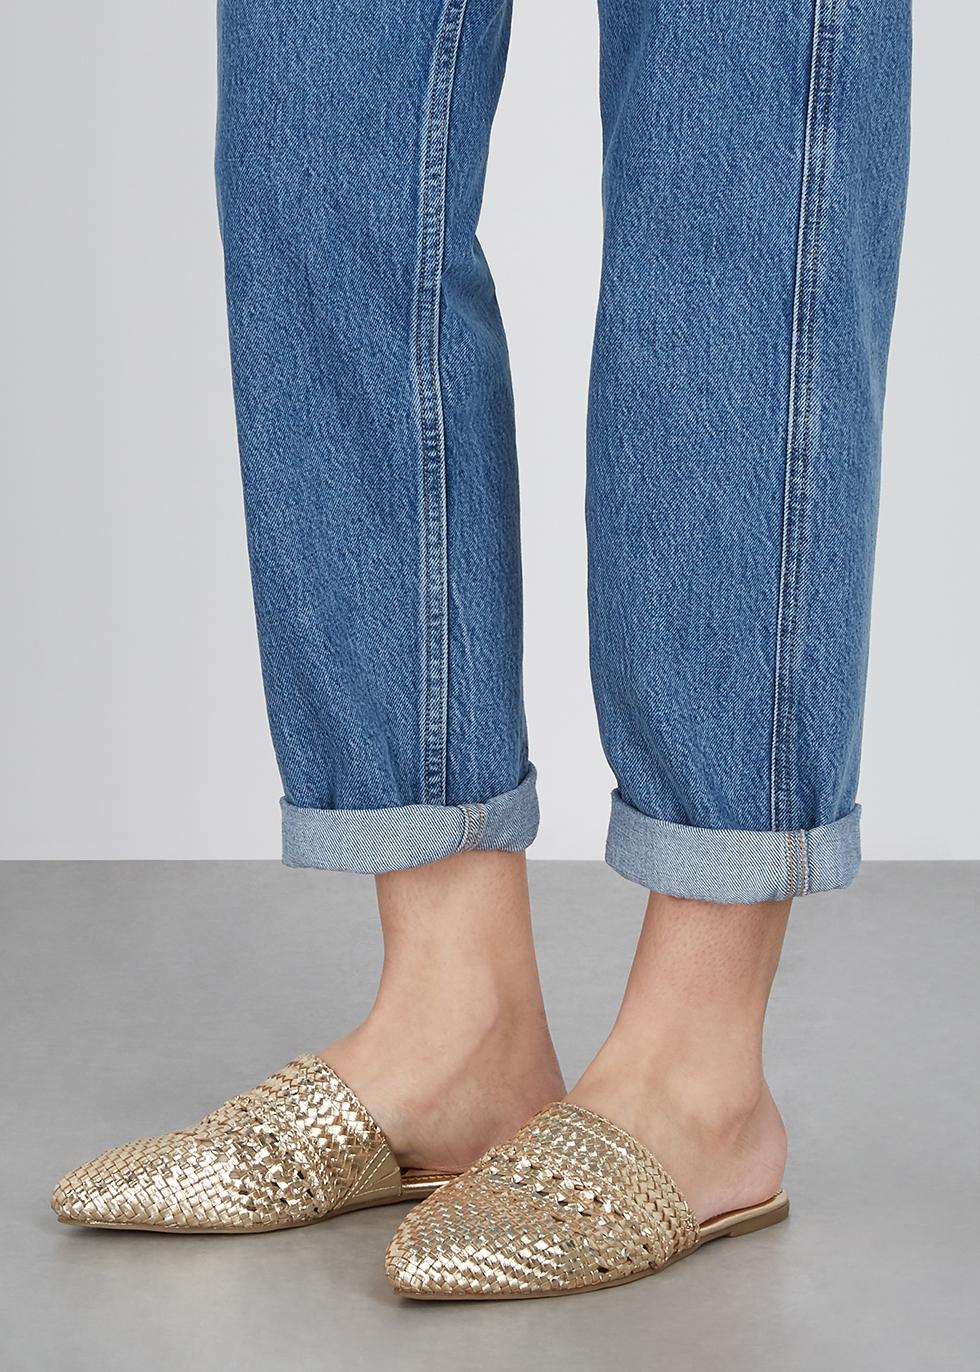 Sam Edelman Womens Natalya Mule Mules Shoes